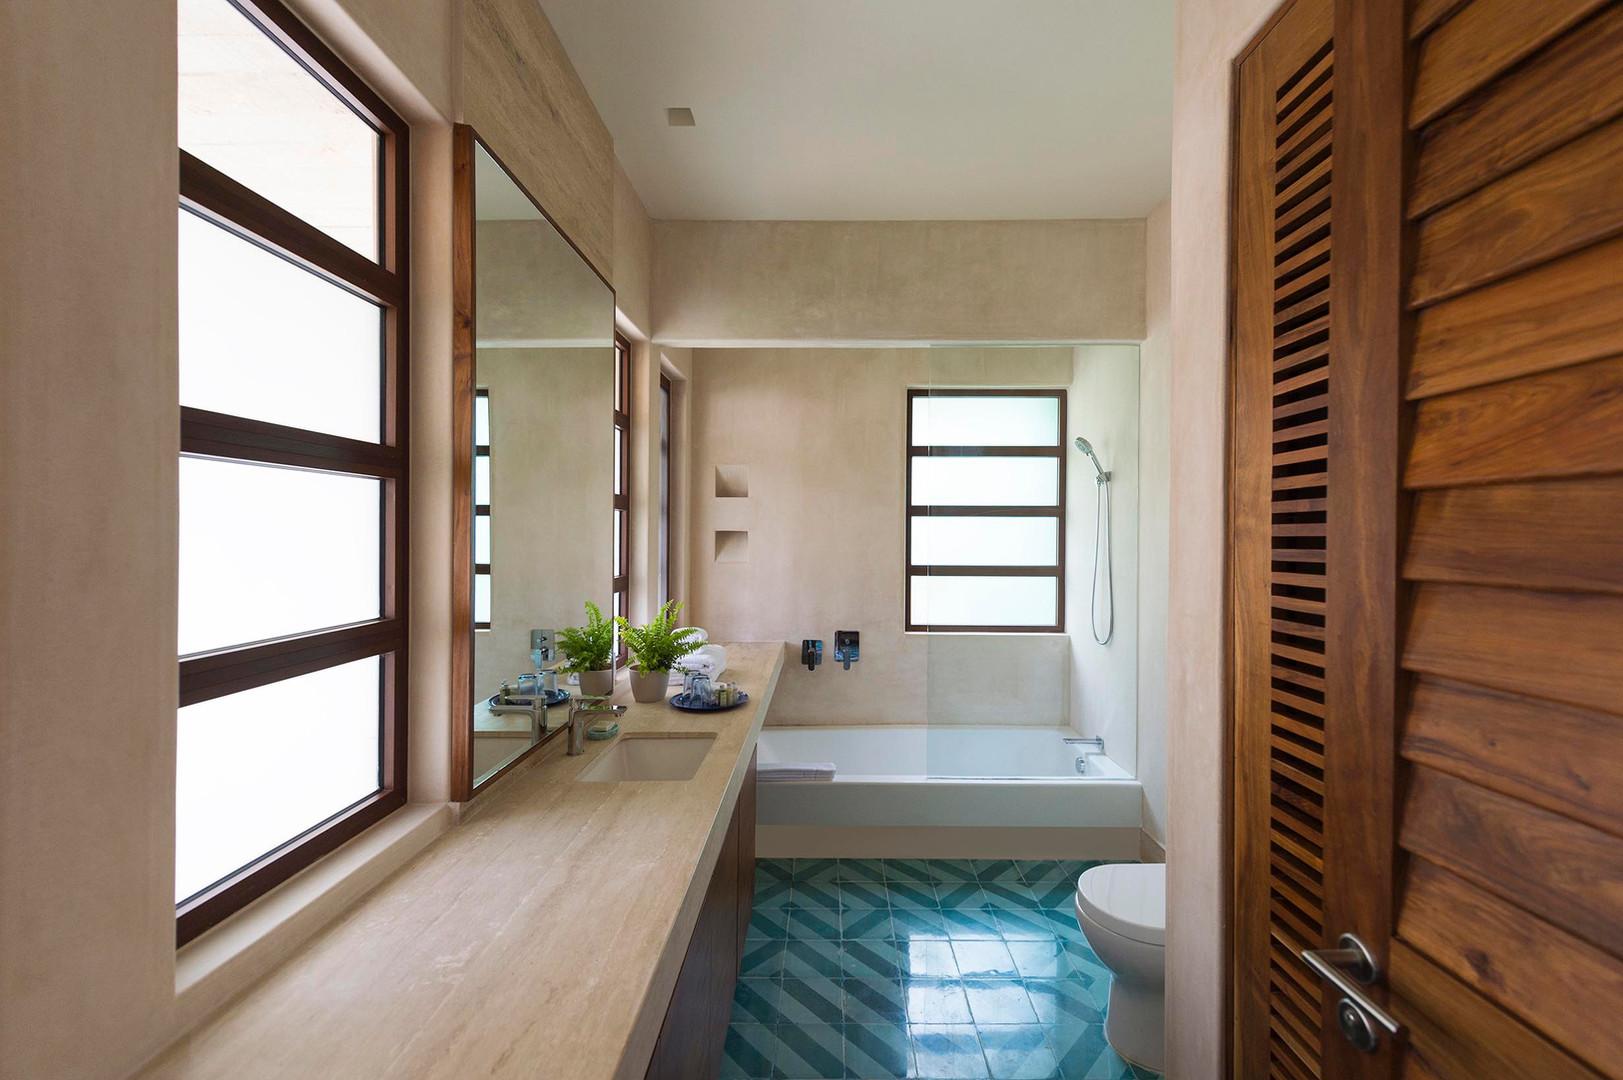 baño_2_full_WEB.jpg